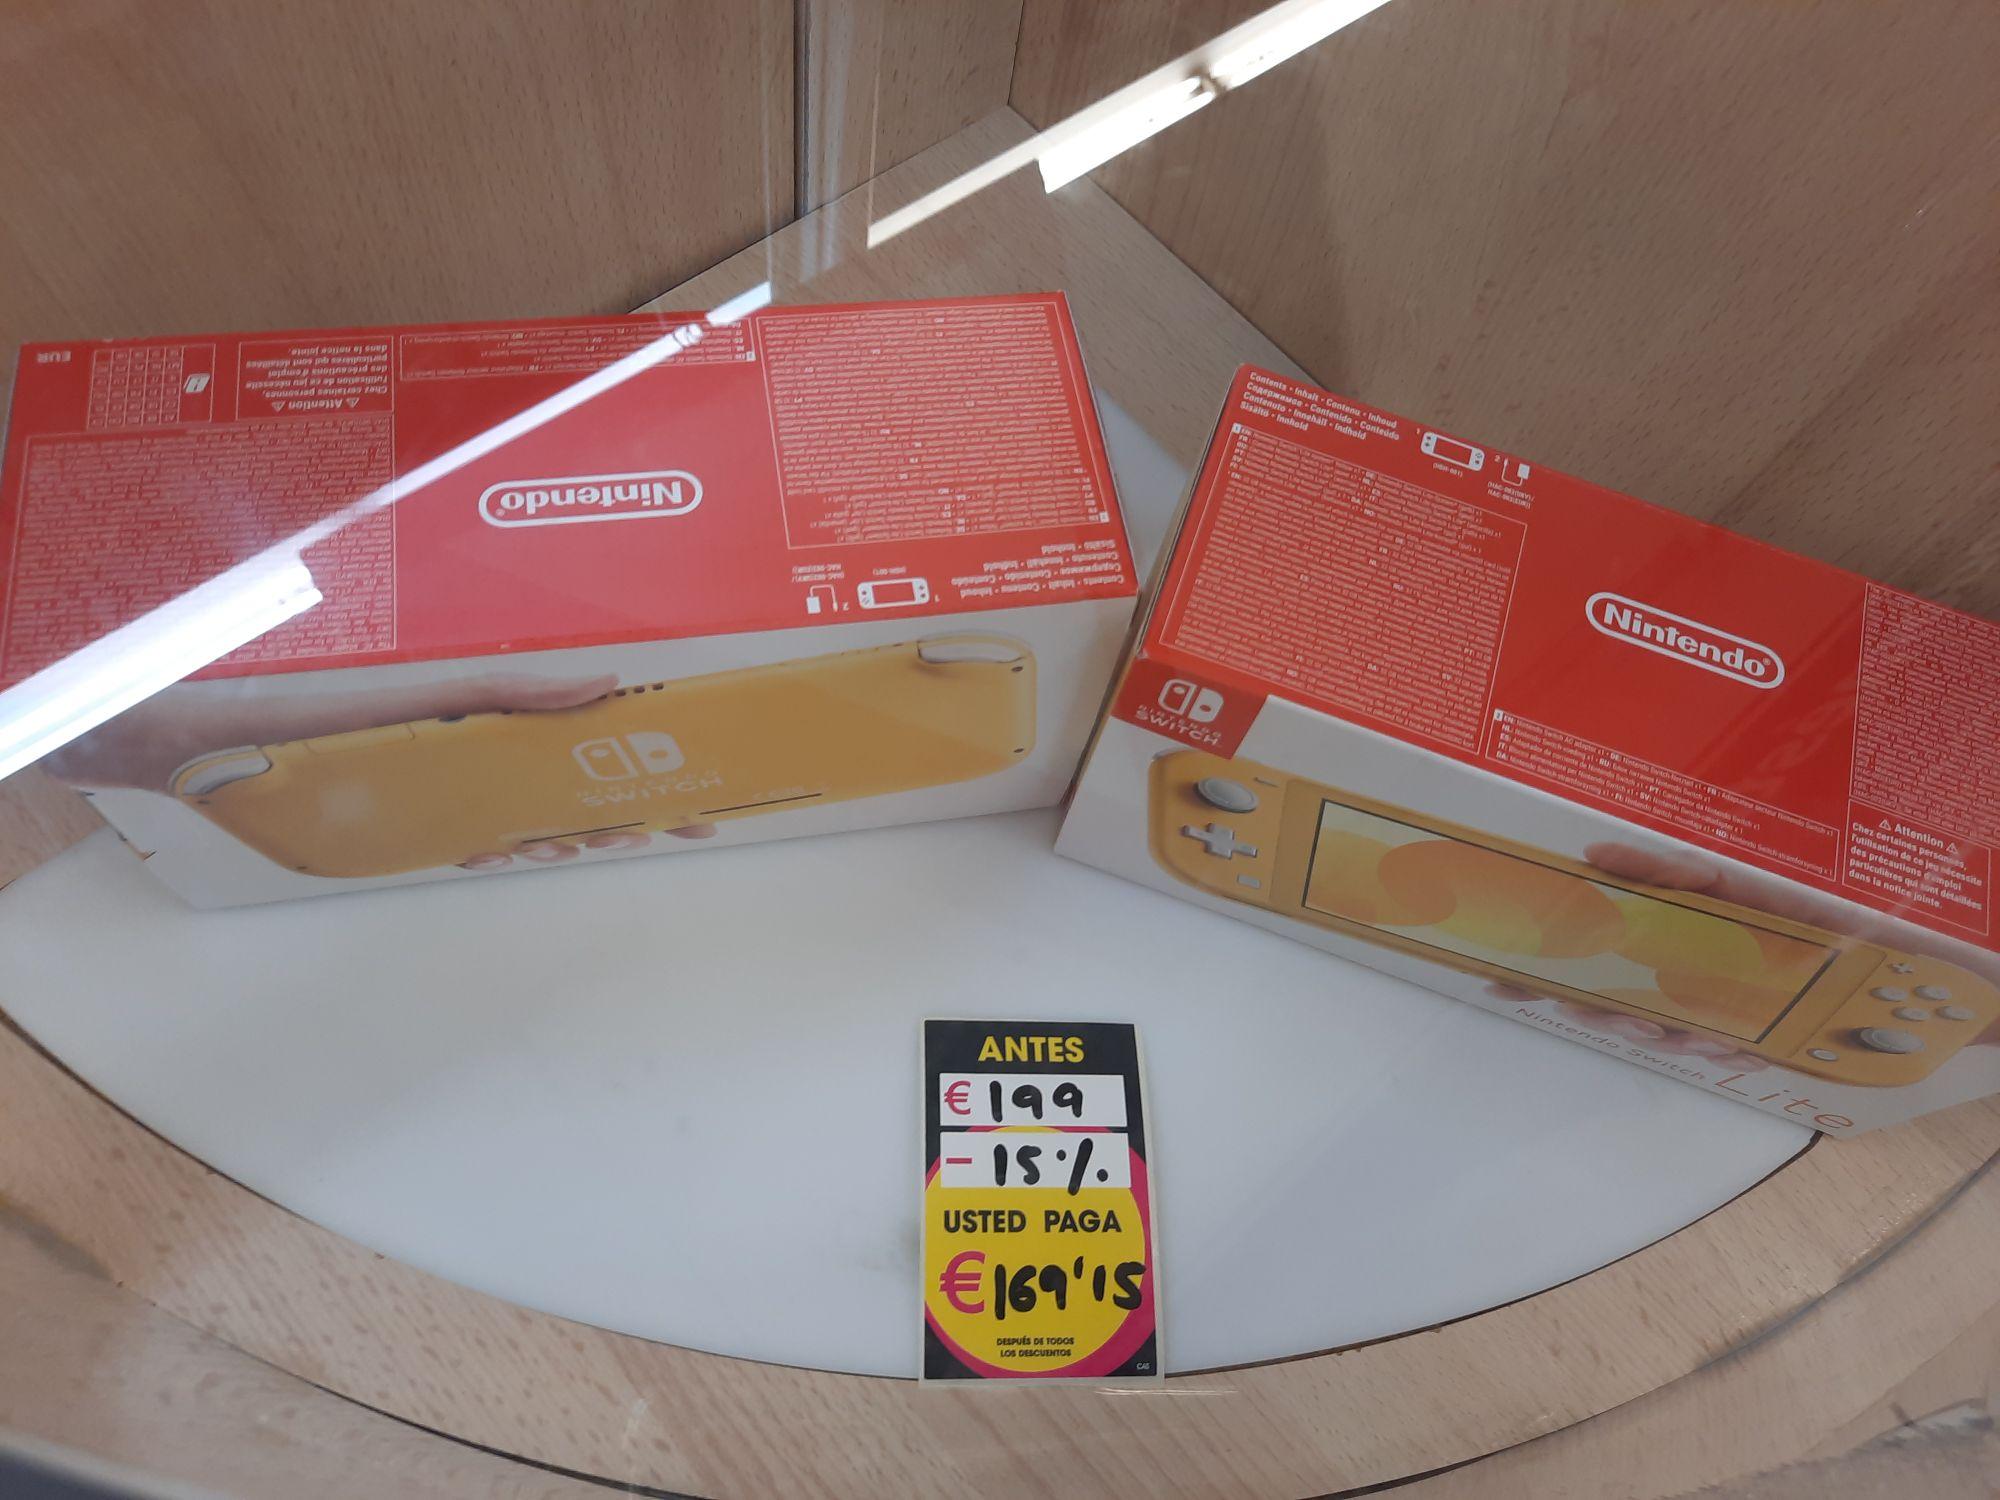 Nintendo Switch Lite amarilla en Eroski del CC Luz del Tajo, Toledo.